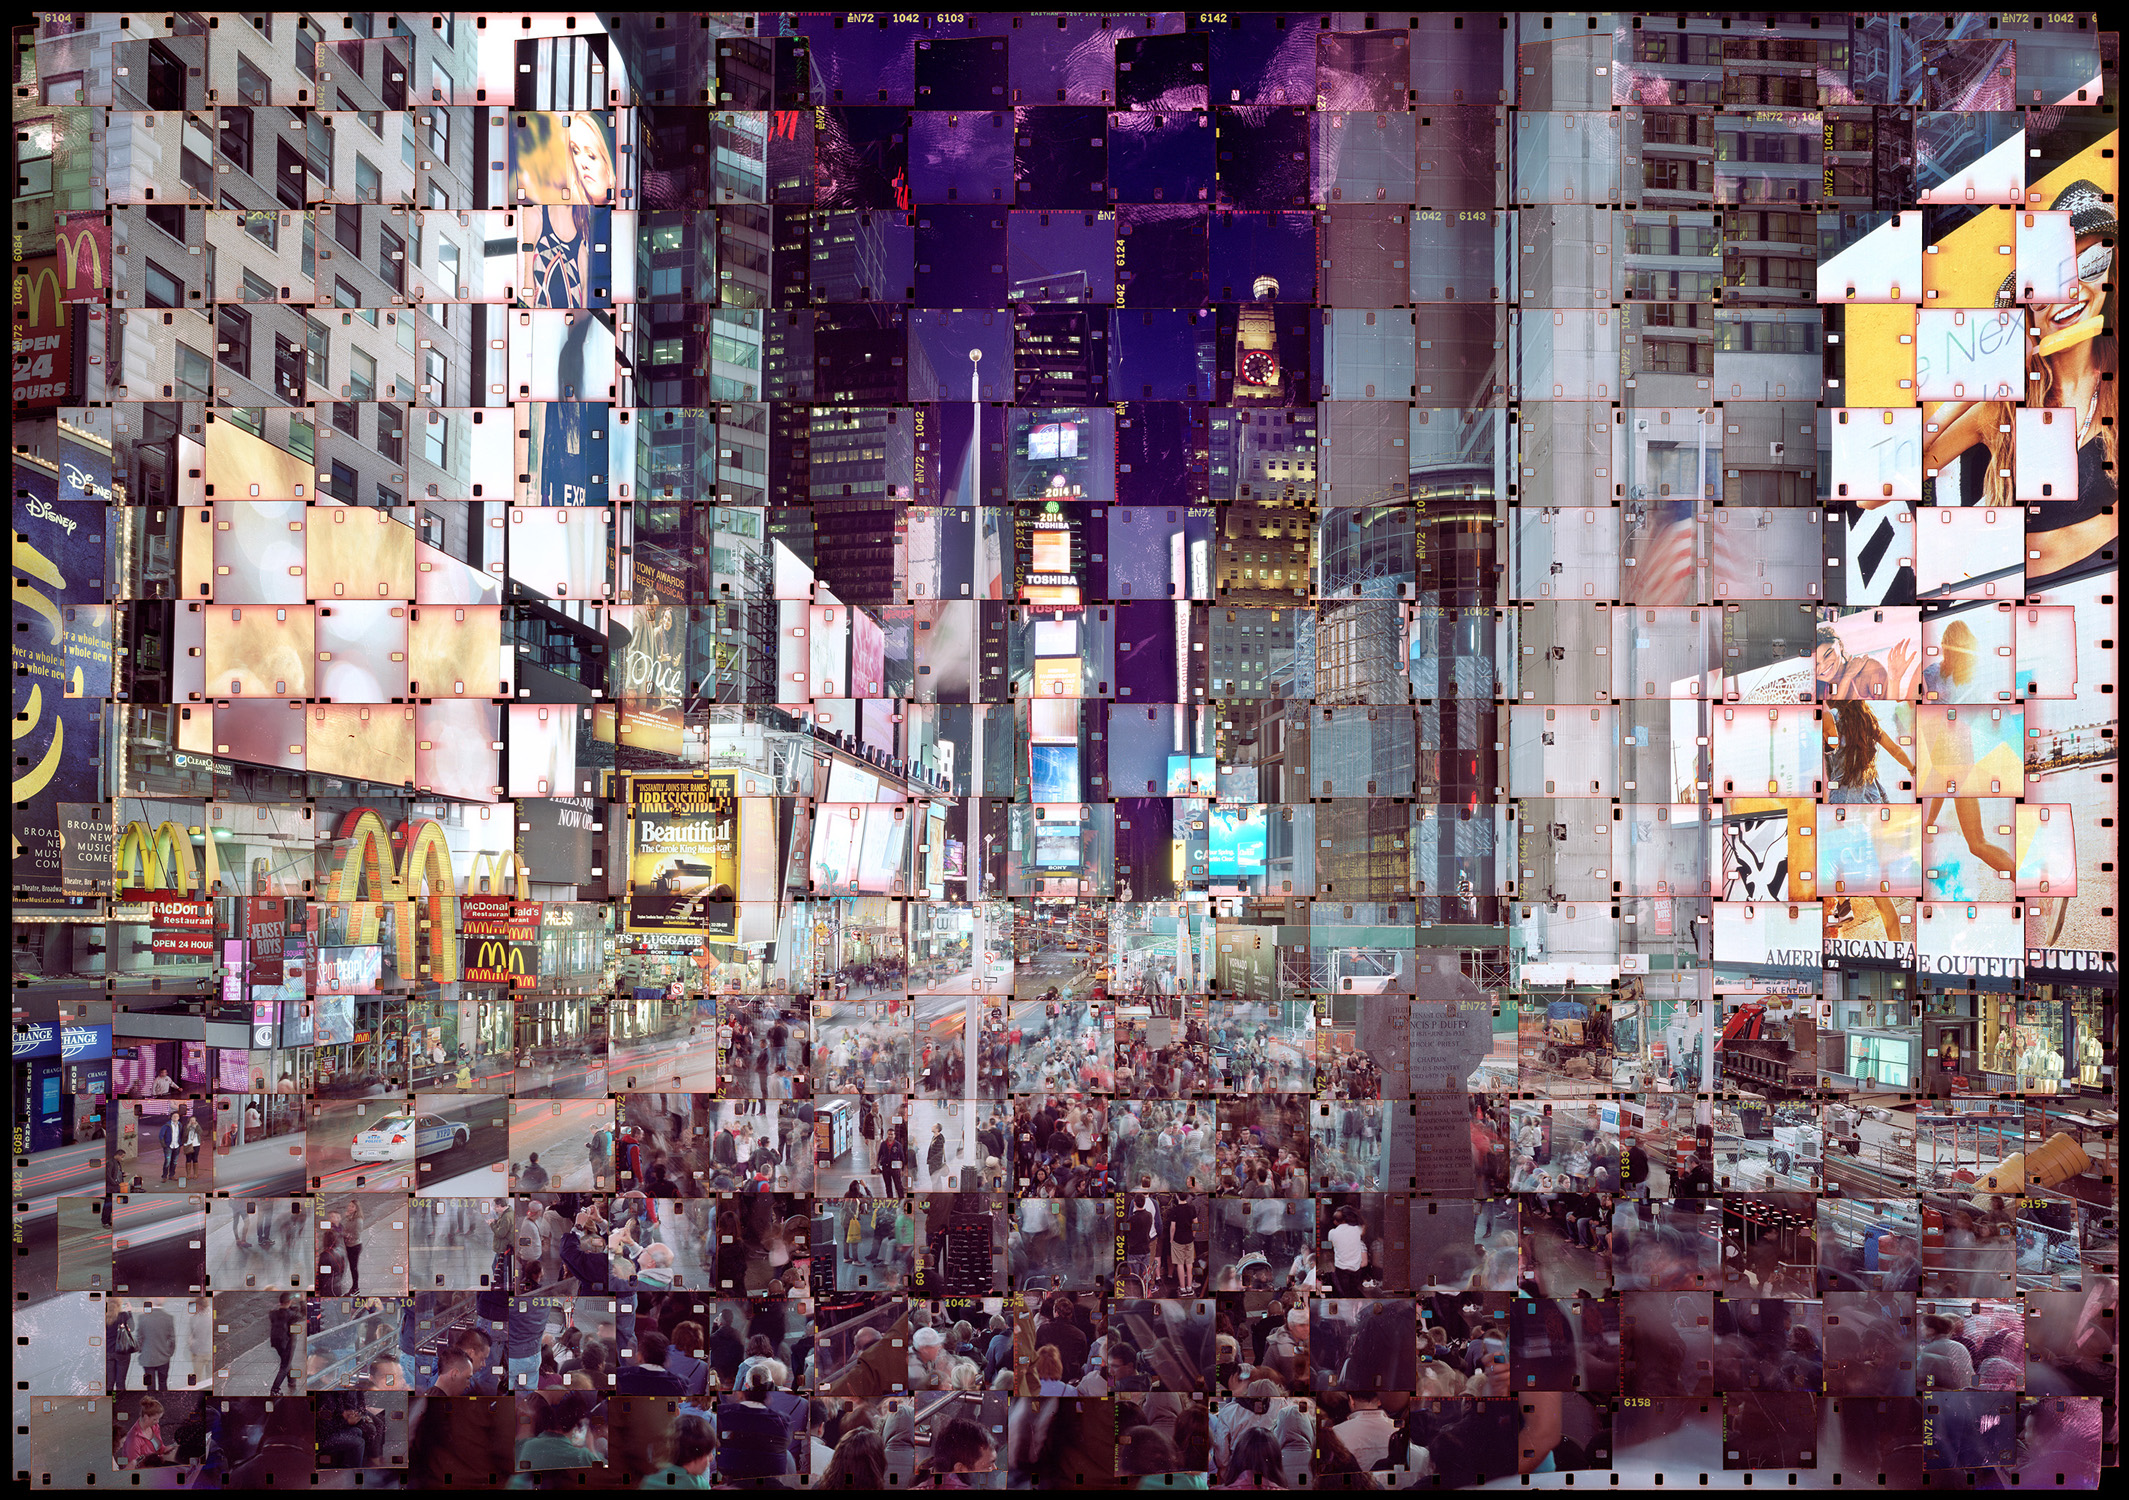 Parkseunghoon_TEXTUS 216 Times square_Digital C Print_100cmx142cm_2015.jpg